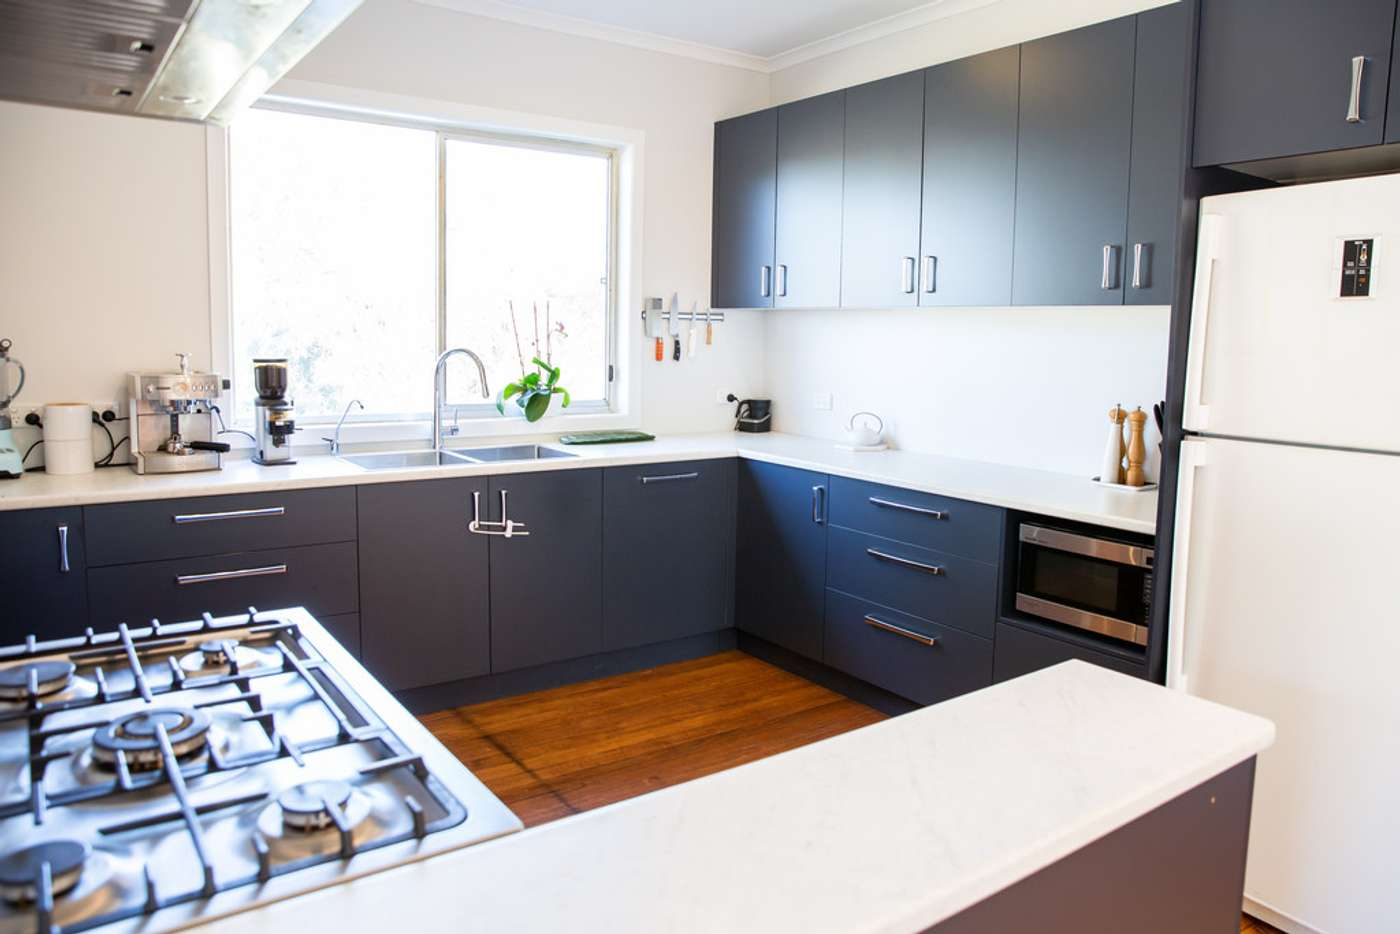 Sixth view of Homely mixedFarming listing, 62 ACRES YARRAGON-LEONGATHA ROAD-ALLAMBEE, Yarragon South VIC 3823